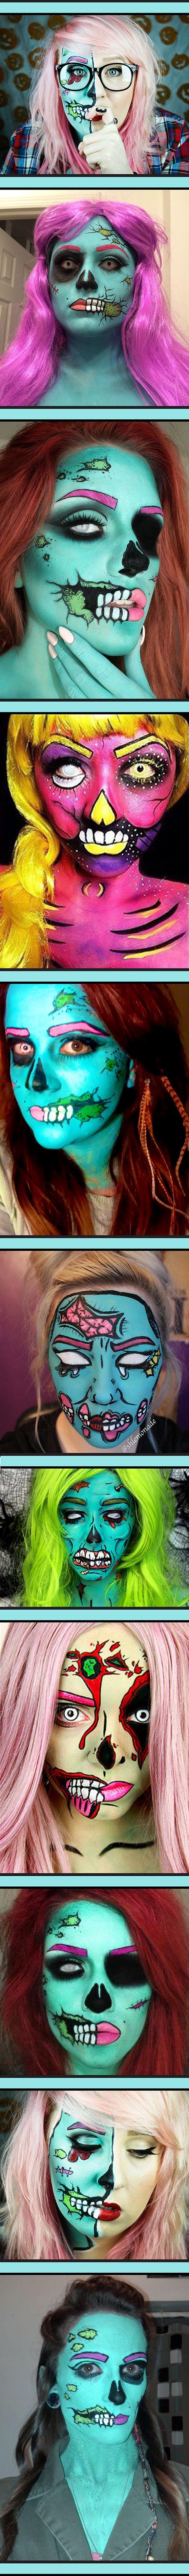 Zombie pop art makeup. Fun Halloween idea.